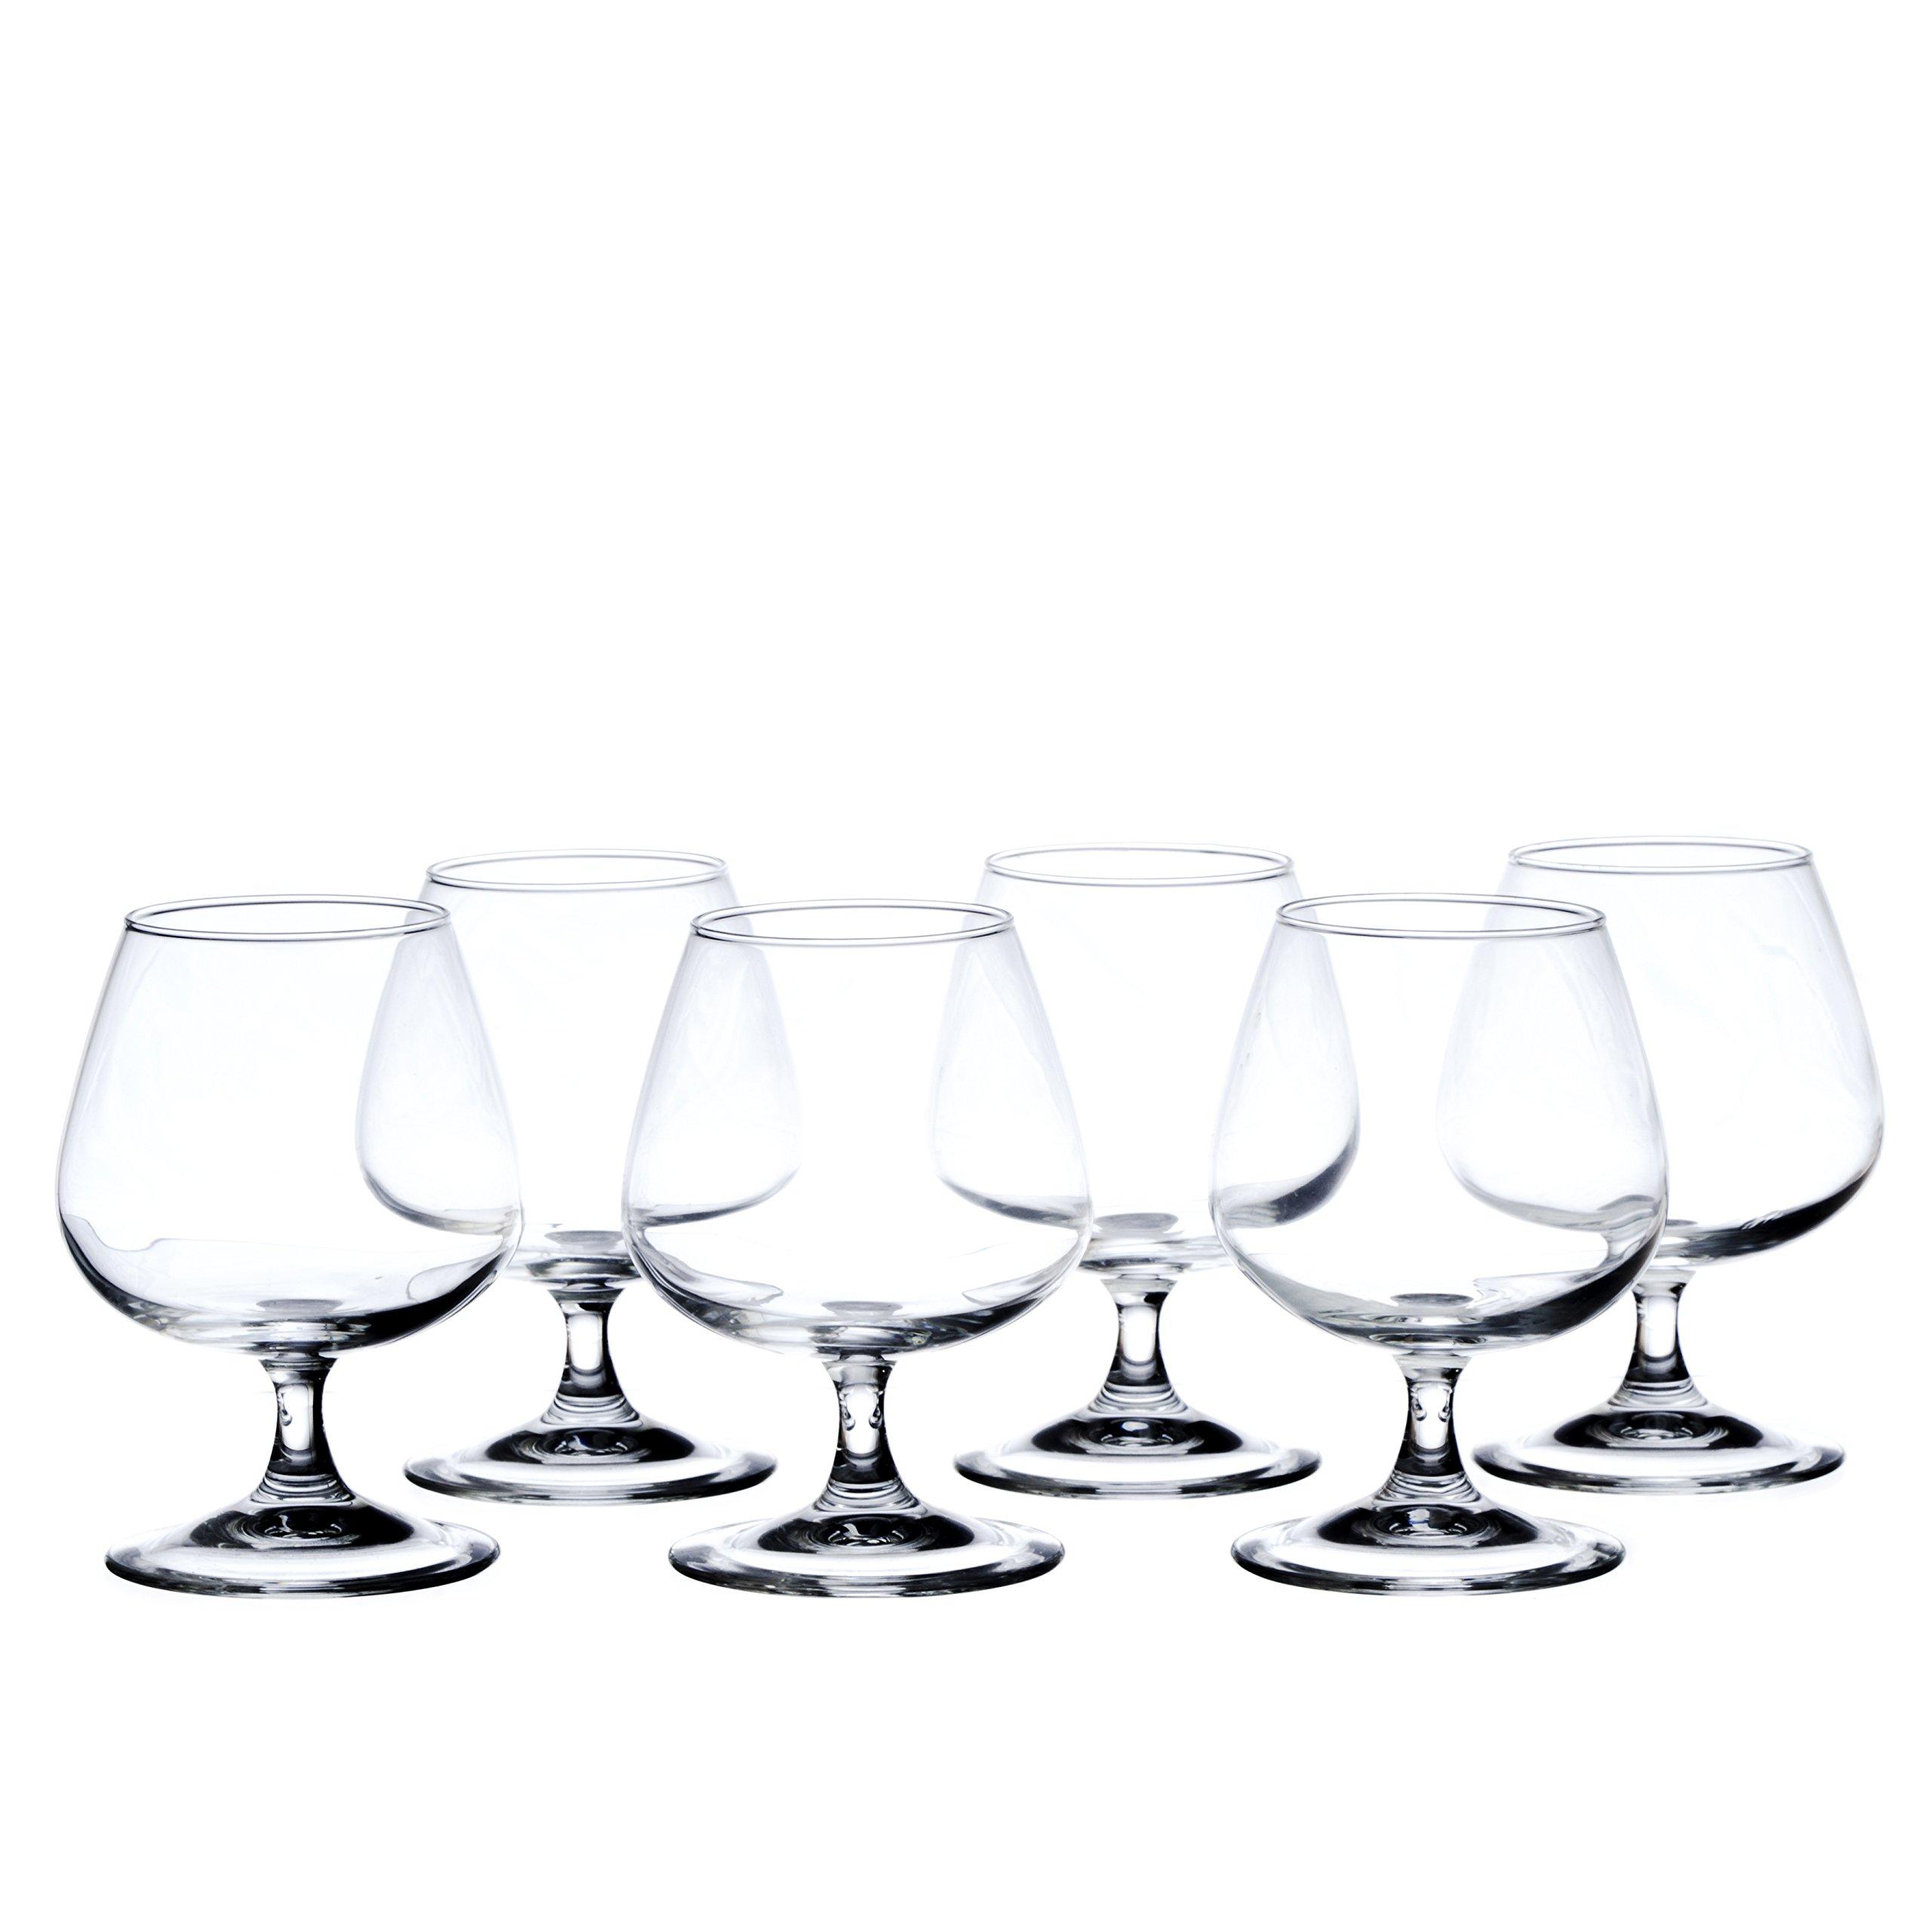 Brandy/Whiskey Glasses, t.m. Arcoroc, 14 oz. (410 ml.), 6-piece set, 12-piece set (12) by Arcoroc